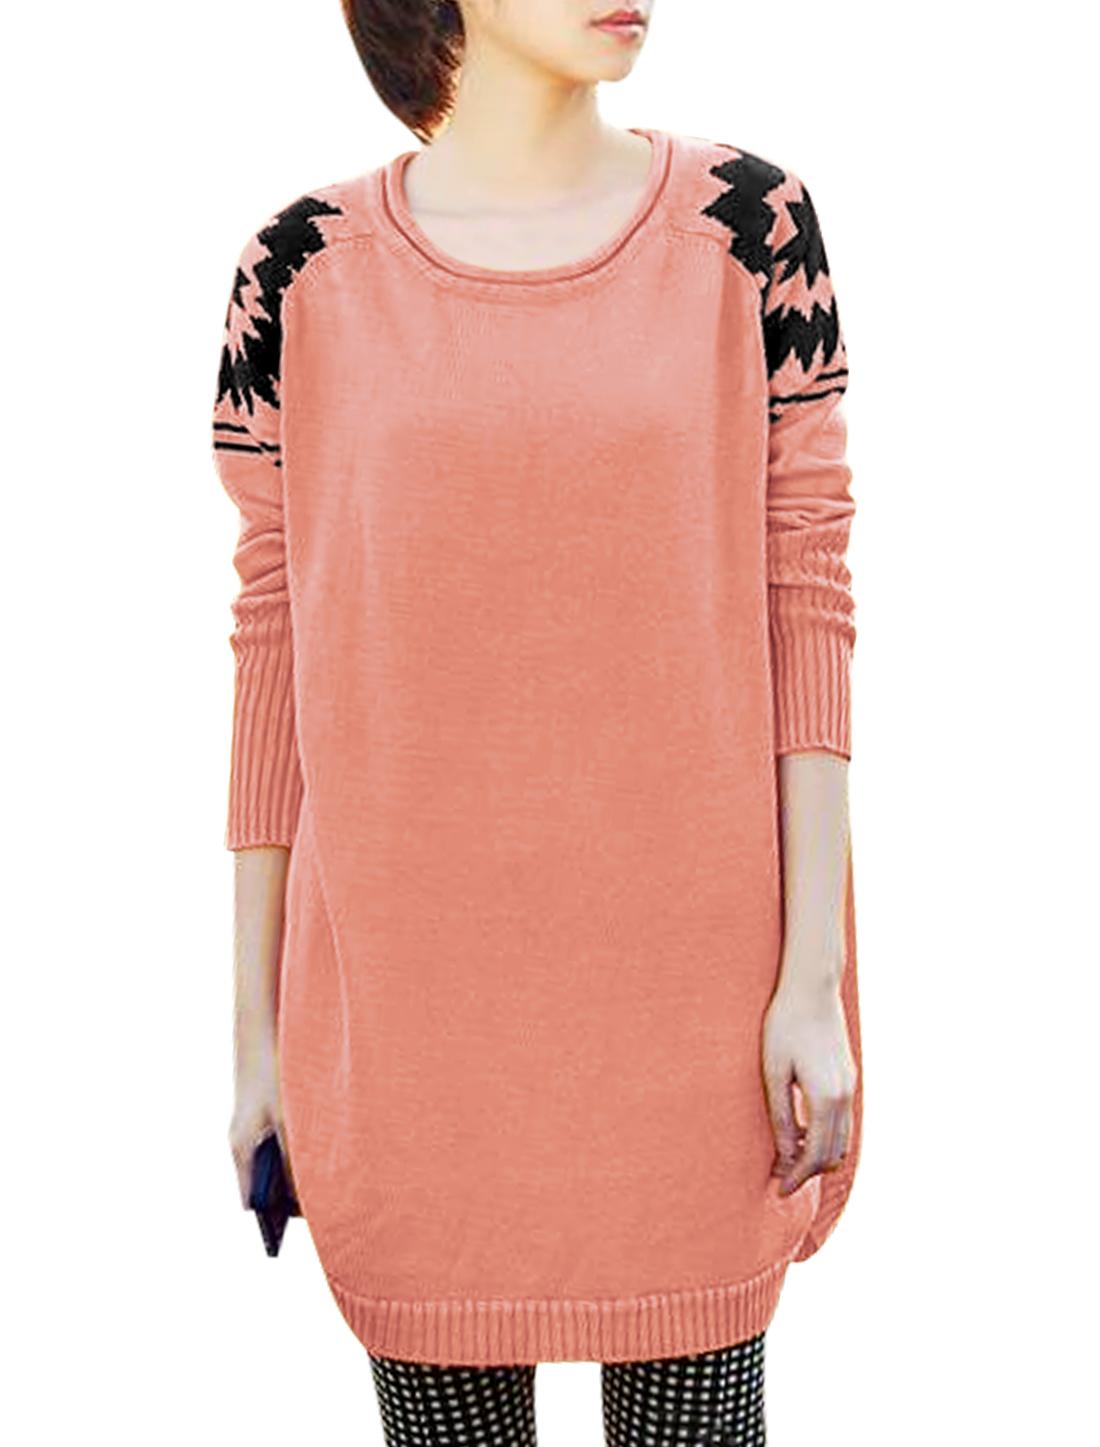 Ladies Pale Pink Round Neck Raglan Sleeves Slipover Round Hem Sweater XS